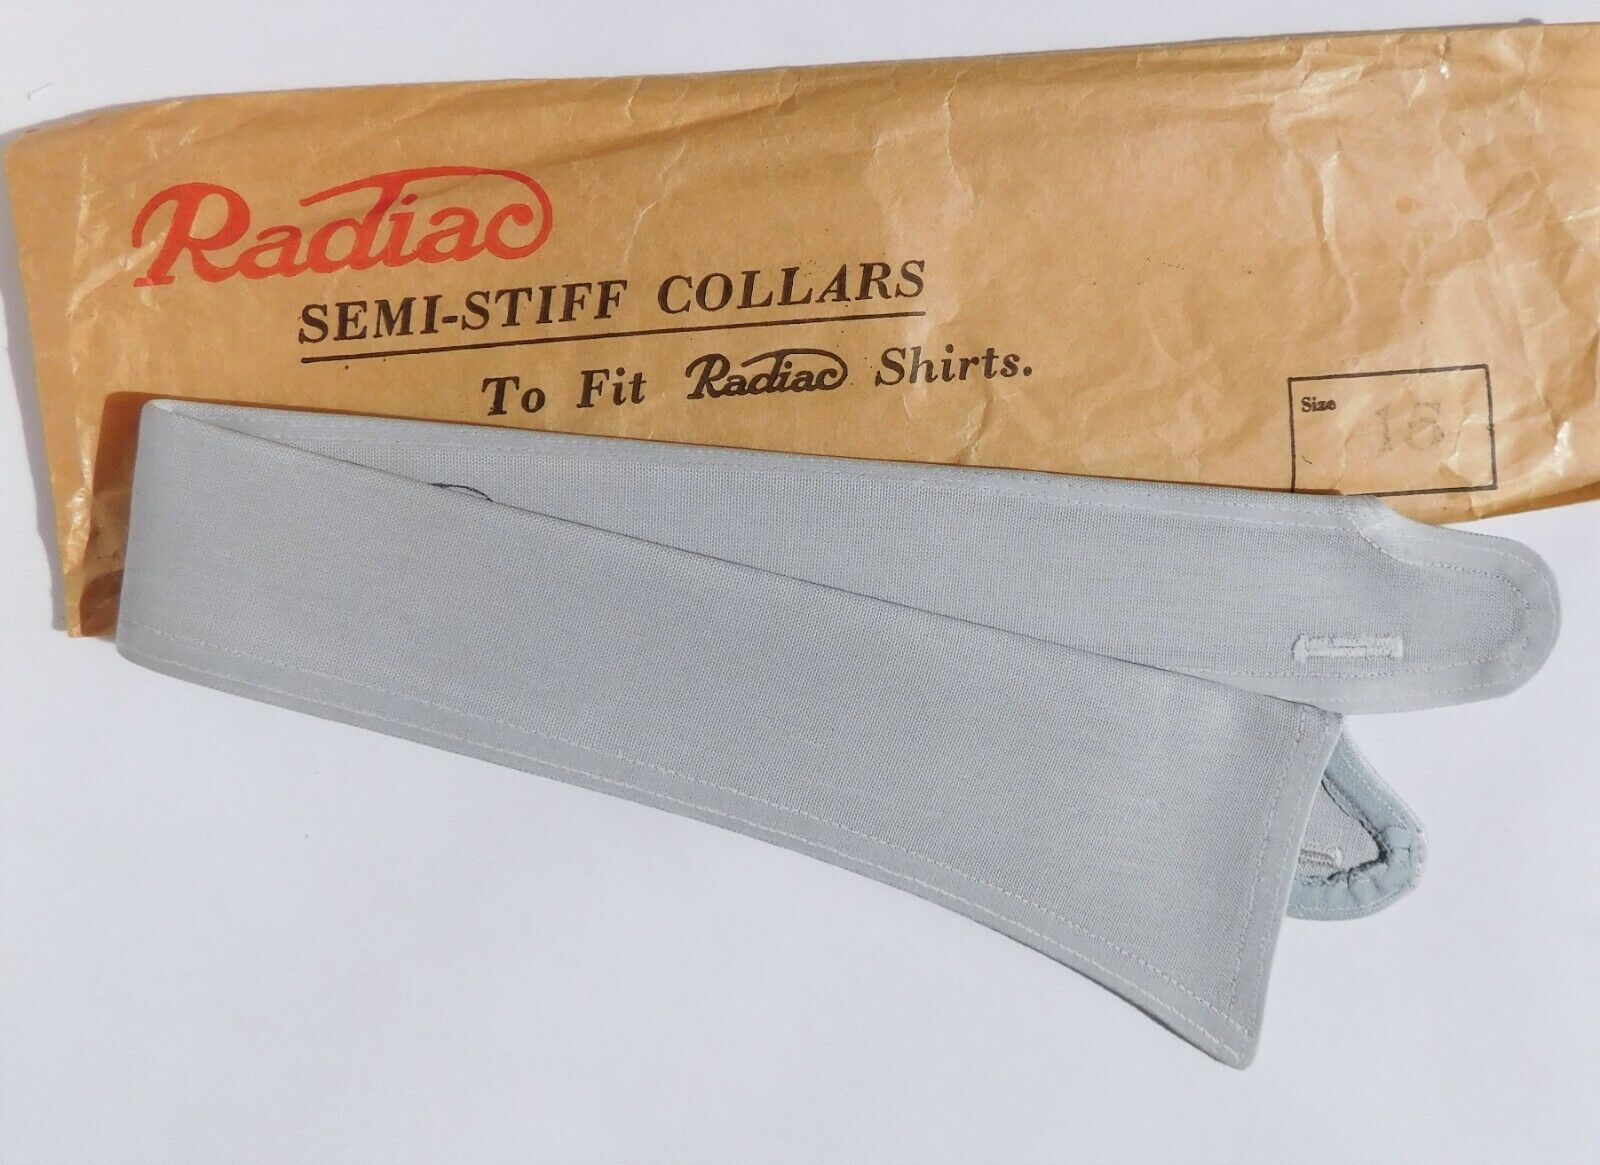 Light grey vintage shirt collar size 15 Radiac Rex UNUSED detachable semi stiff